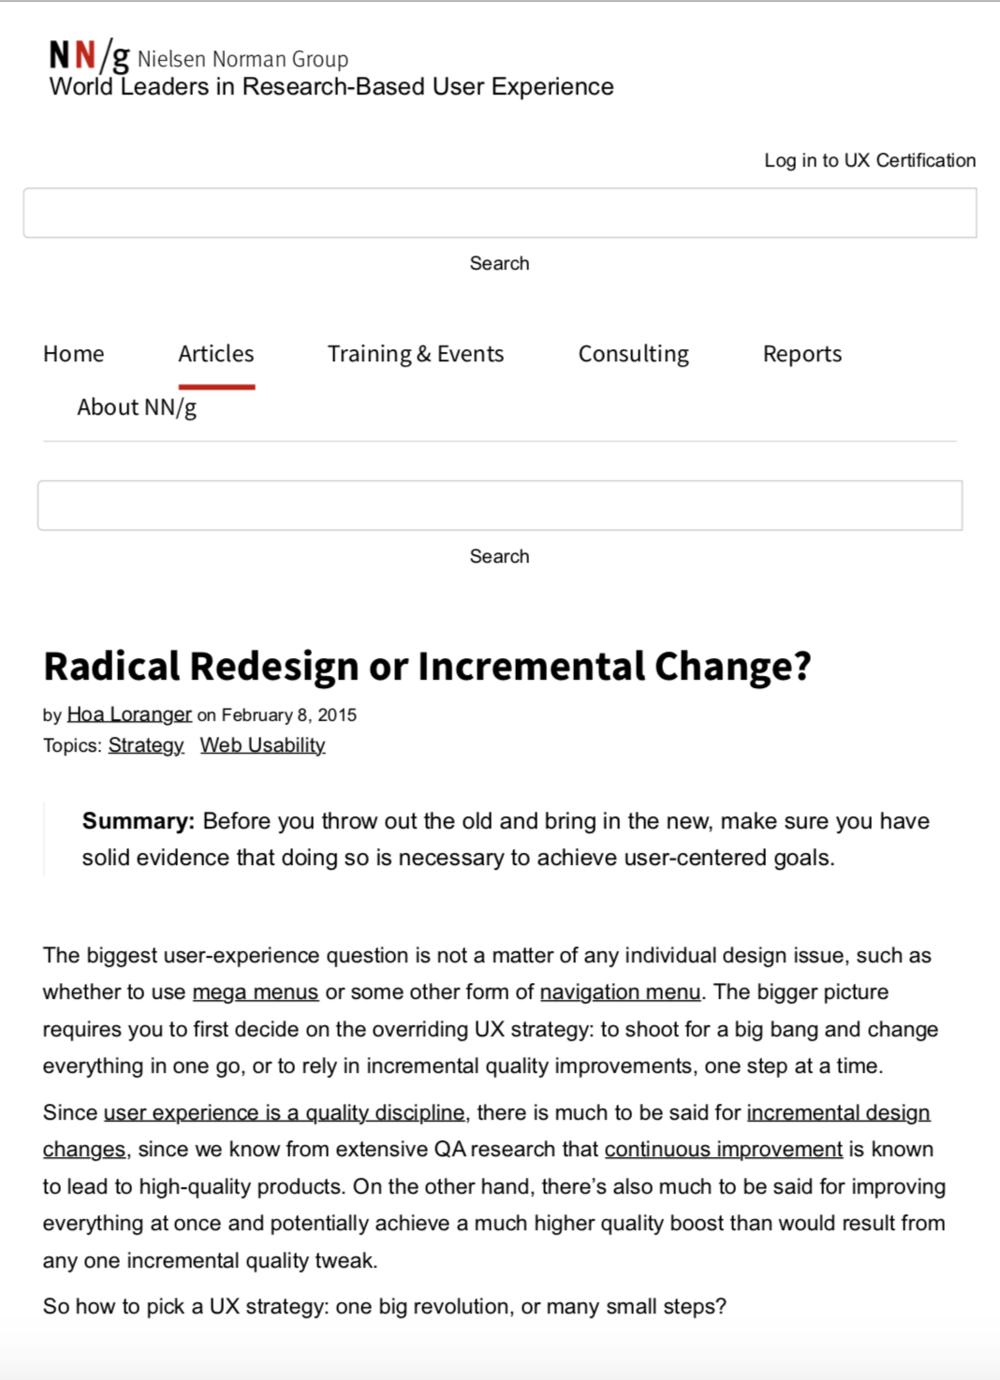 Radical redesign or incremental change? -